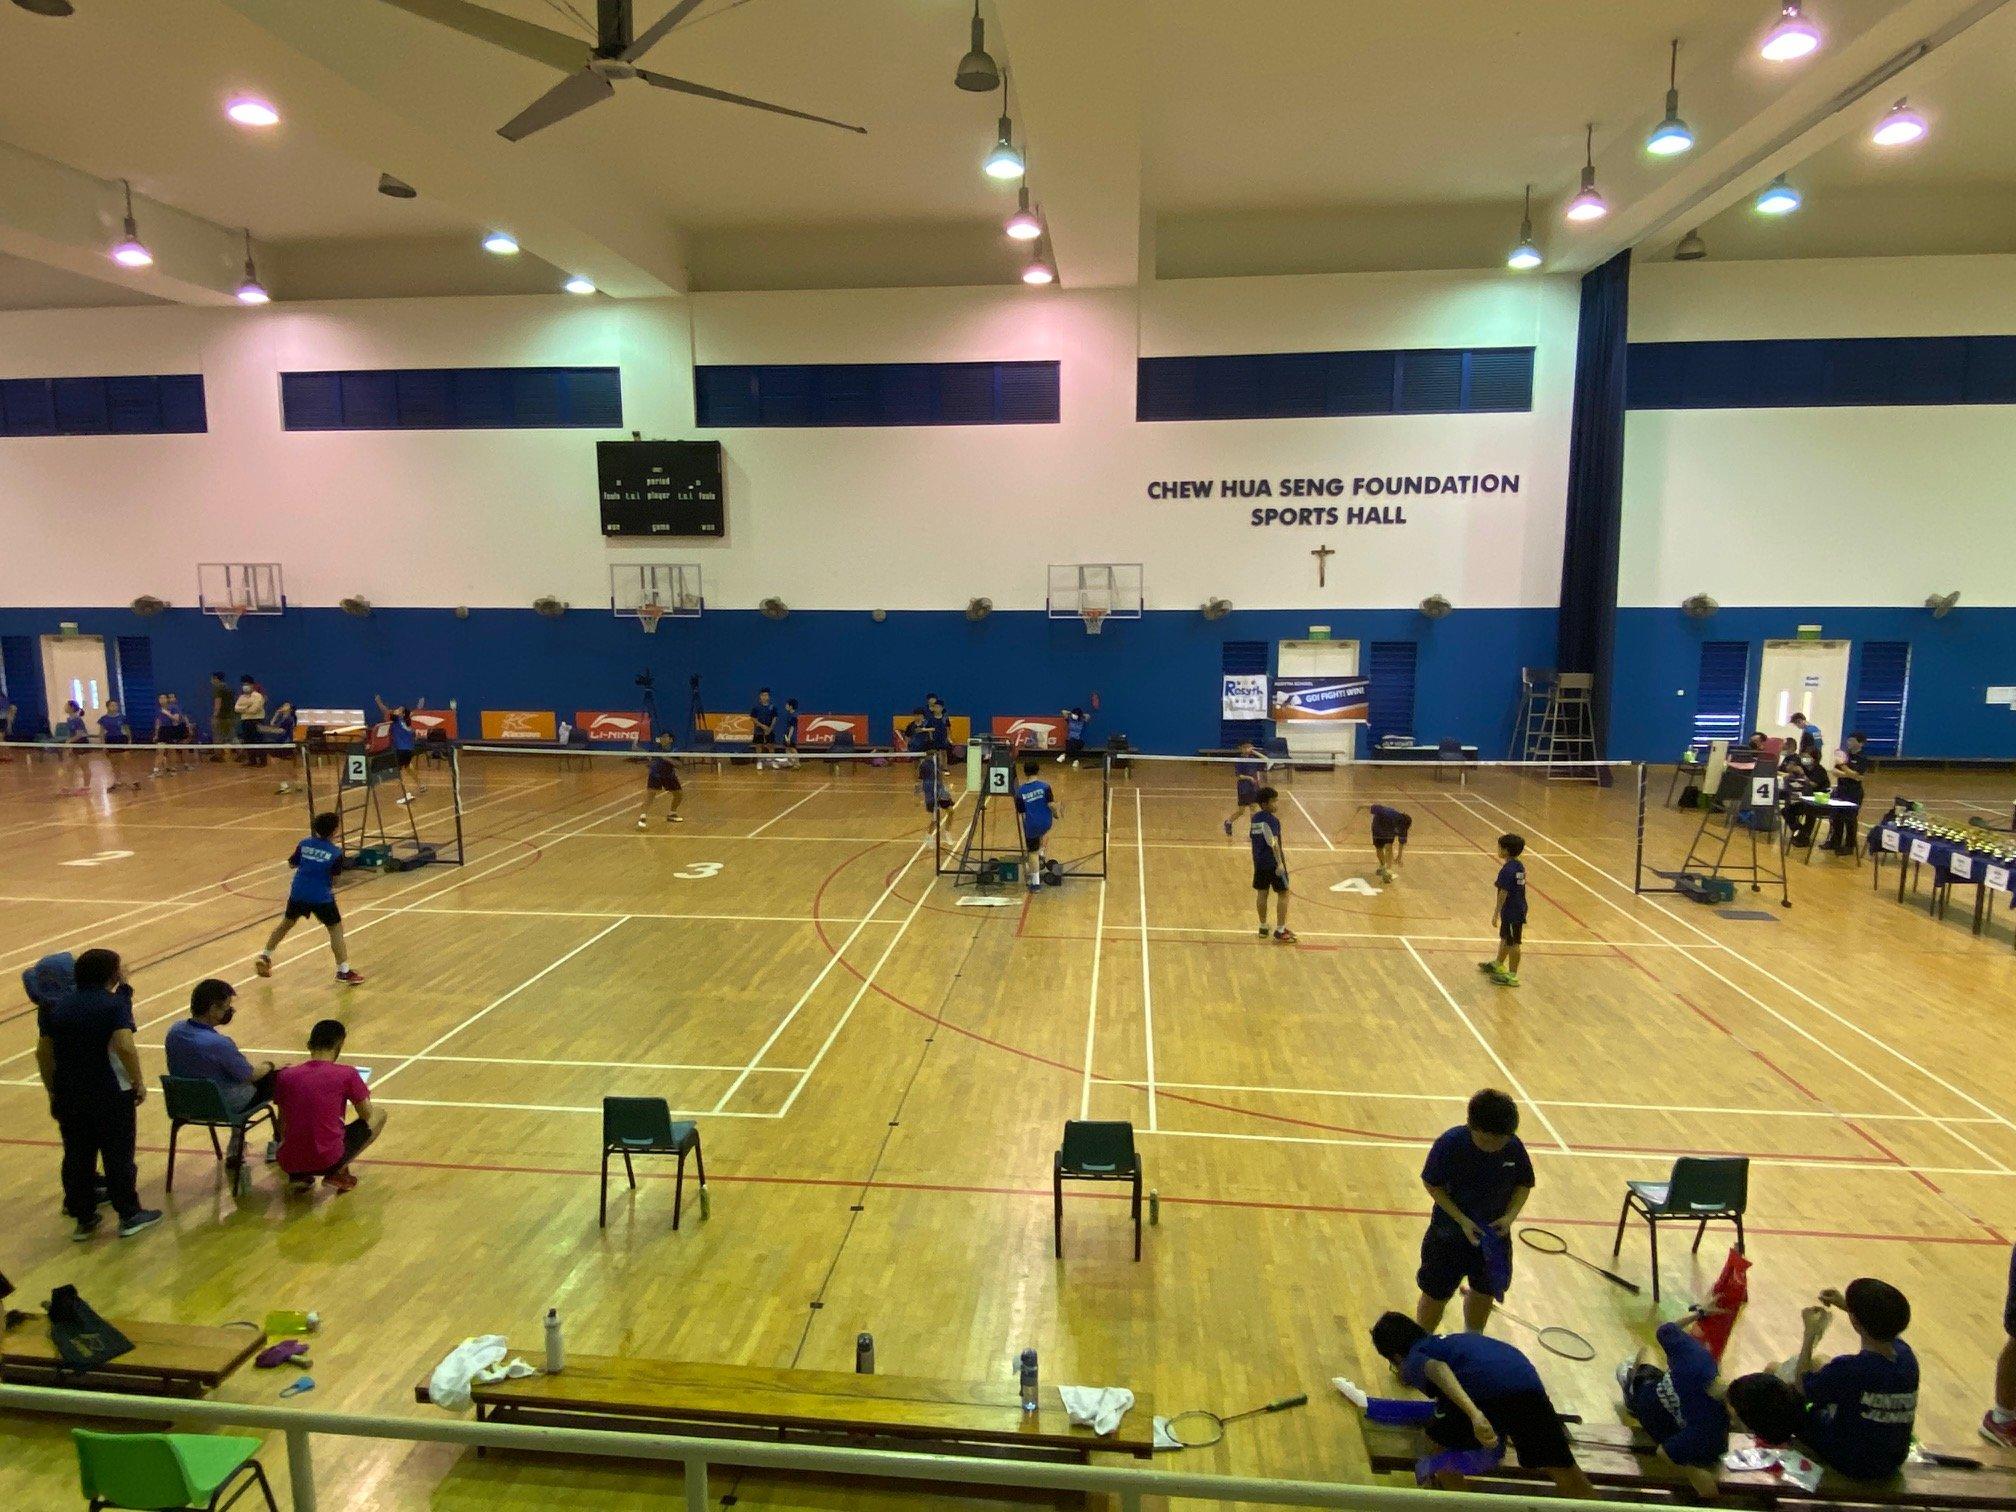 NSG Snr Div North Zone boys' badminton final - warmups